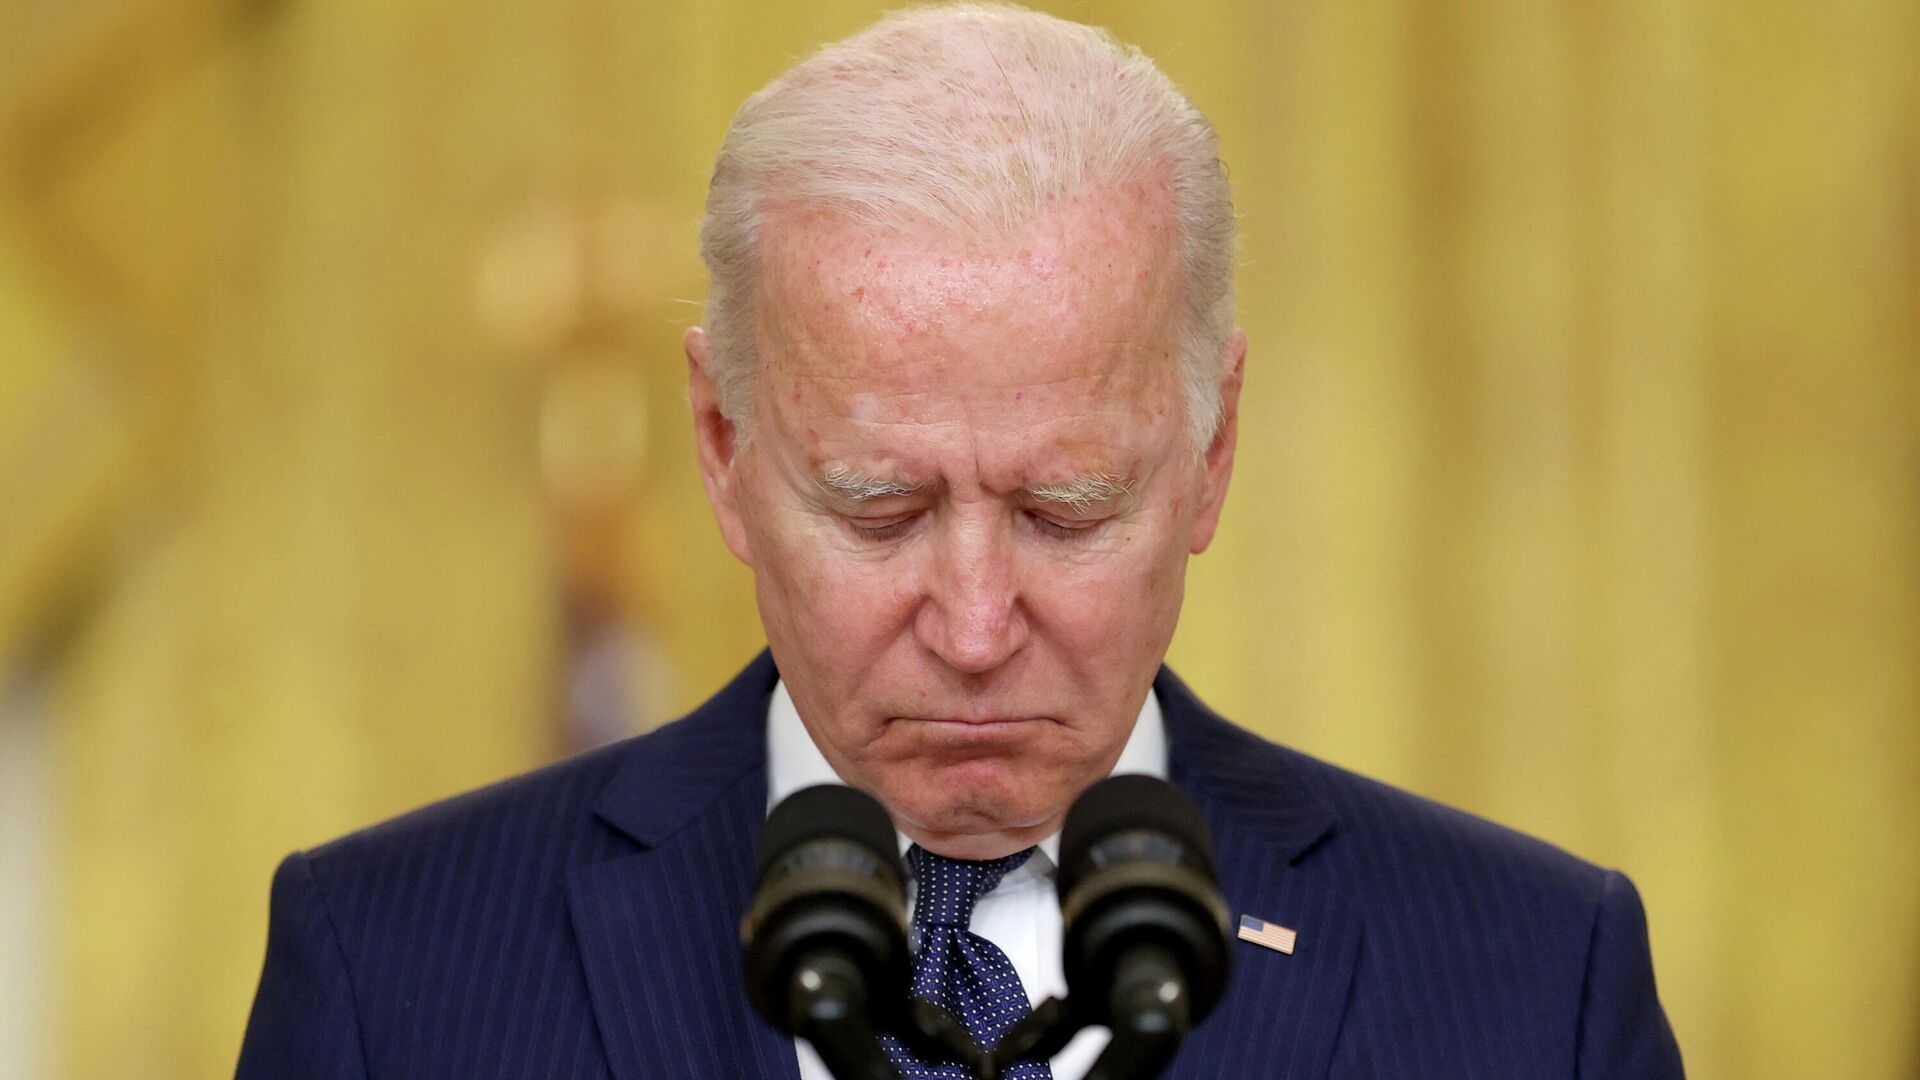 Joe Biden, presidente de EEUU - Sputnik Mundo, 1920, 23.09.2021